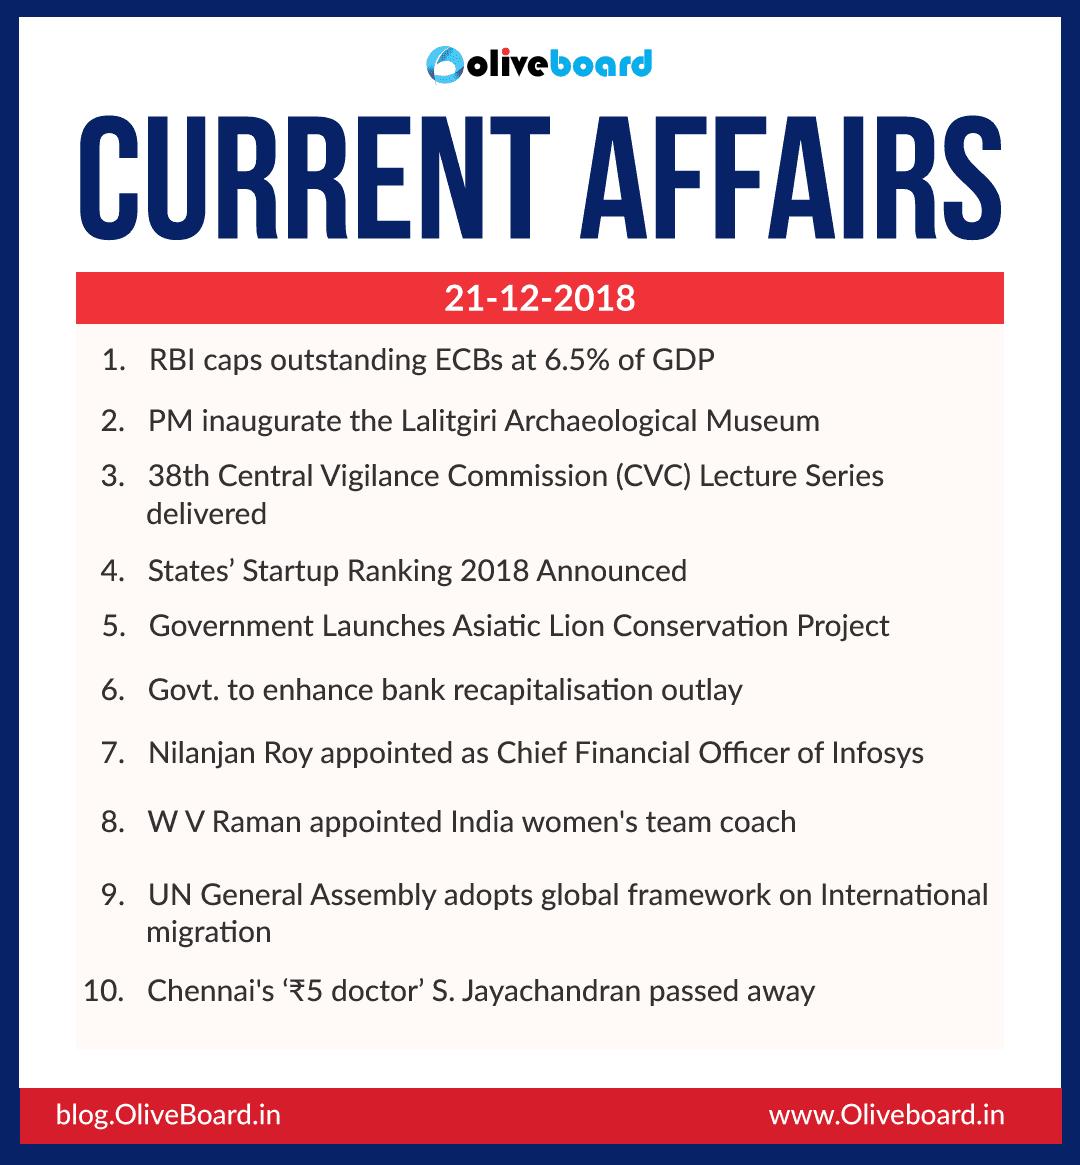 Current Affairs: 21 December 2018